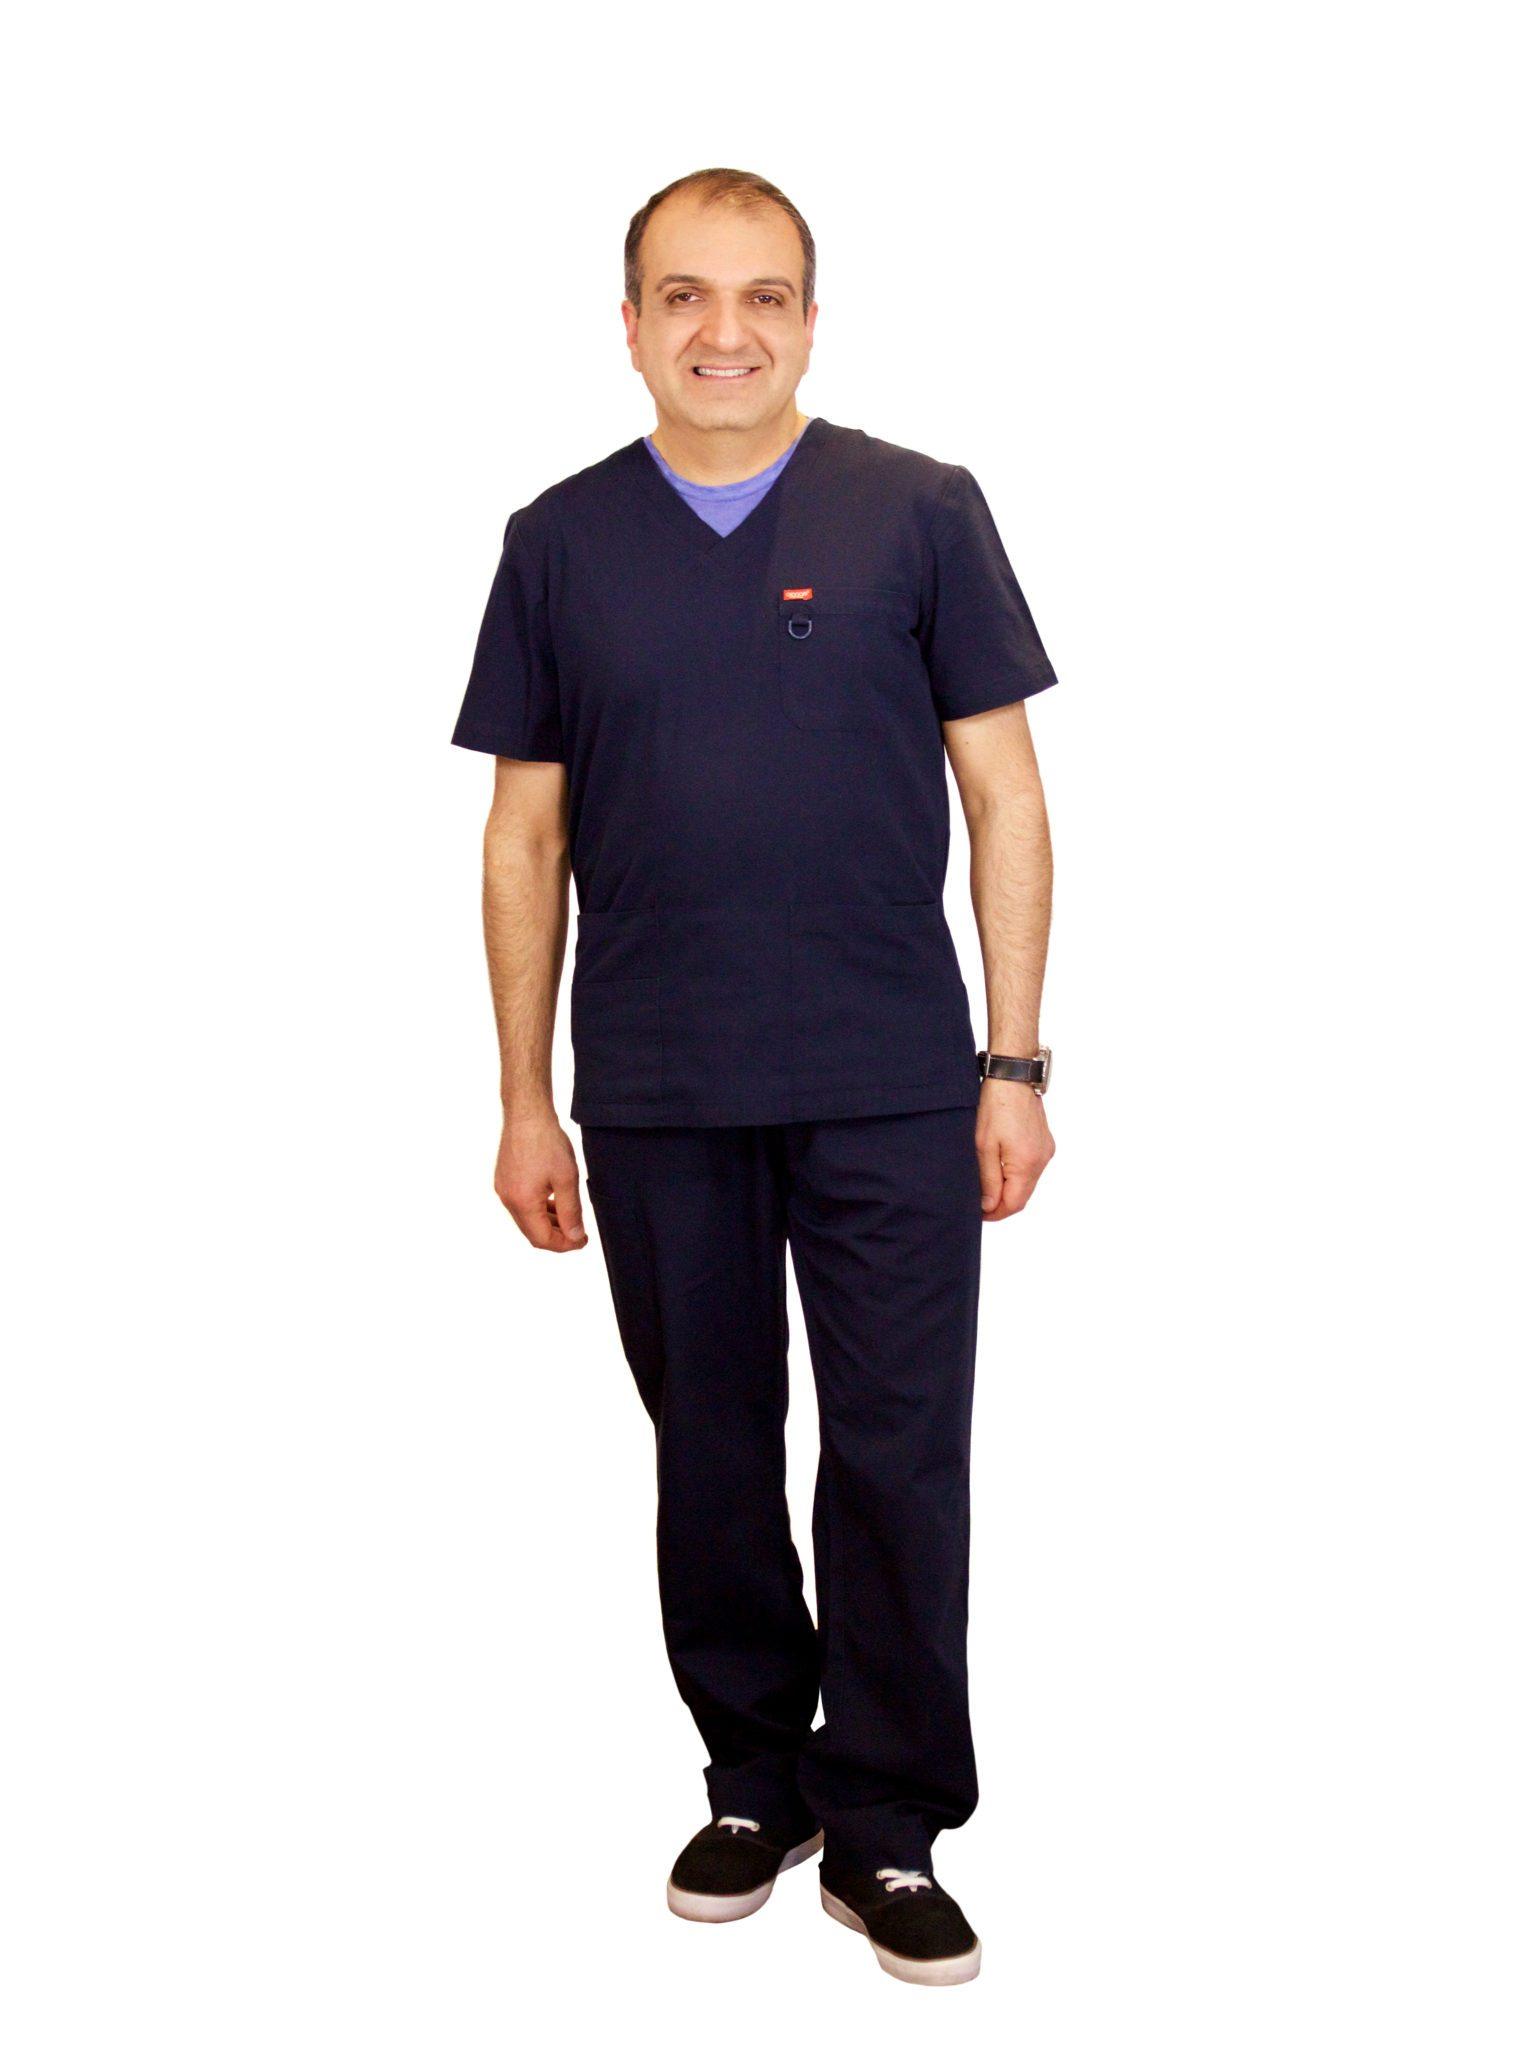 Dental Implants Specialist - Dr. Tehranian - Expert Dentist UK